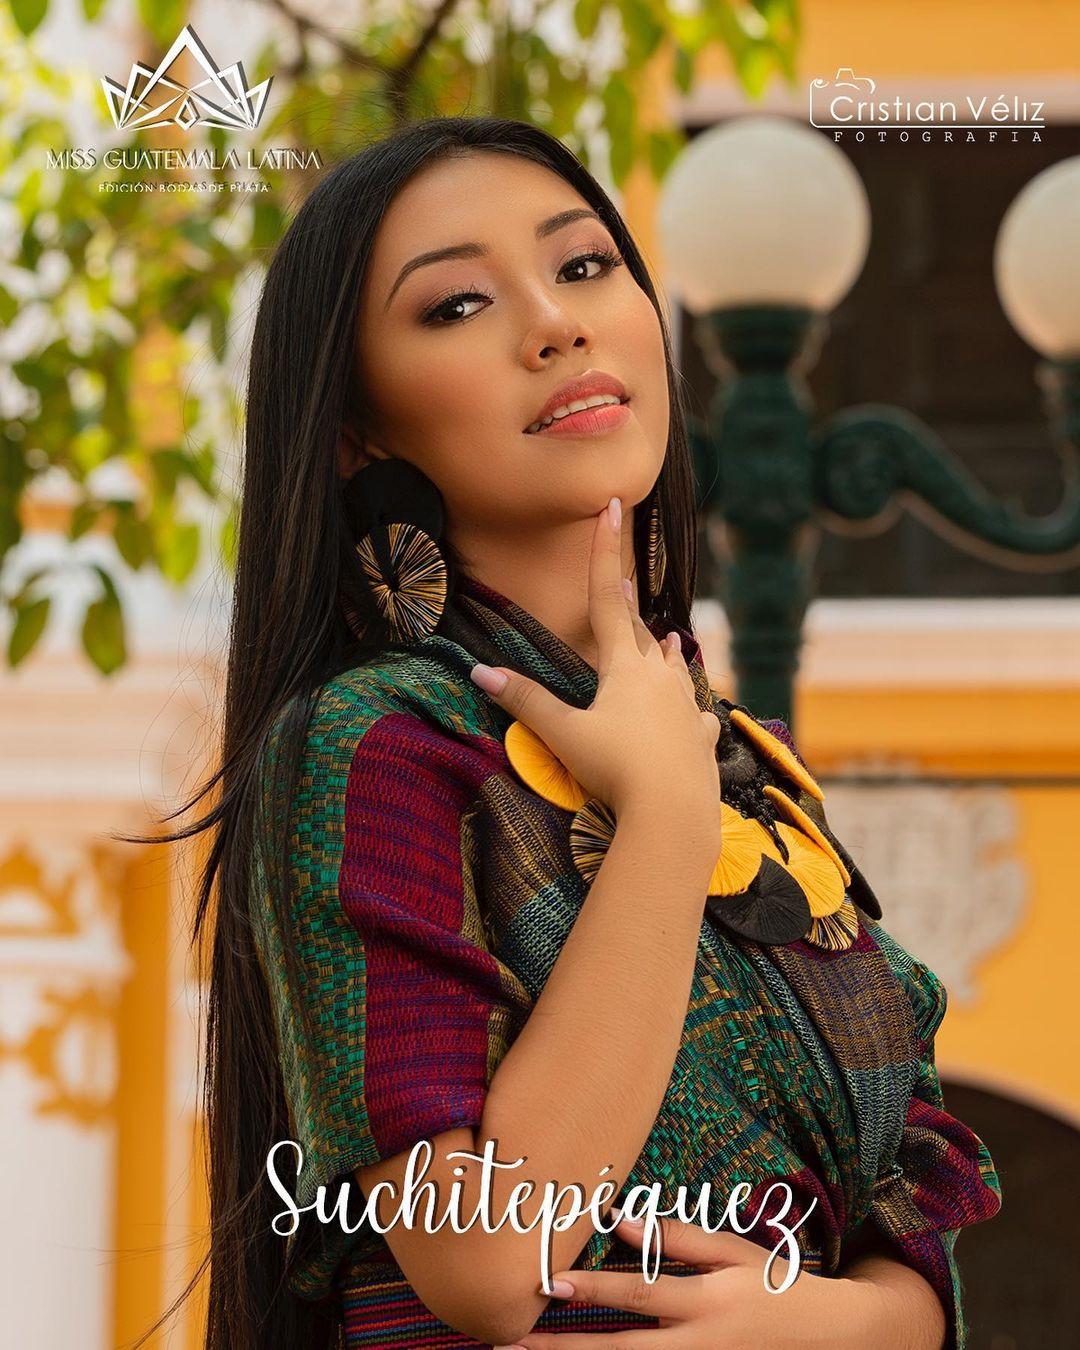 candidatas a miss guatemala latina 2021. final: 30 de abril. - Página 3 B2rFEb